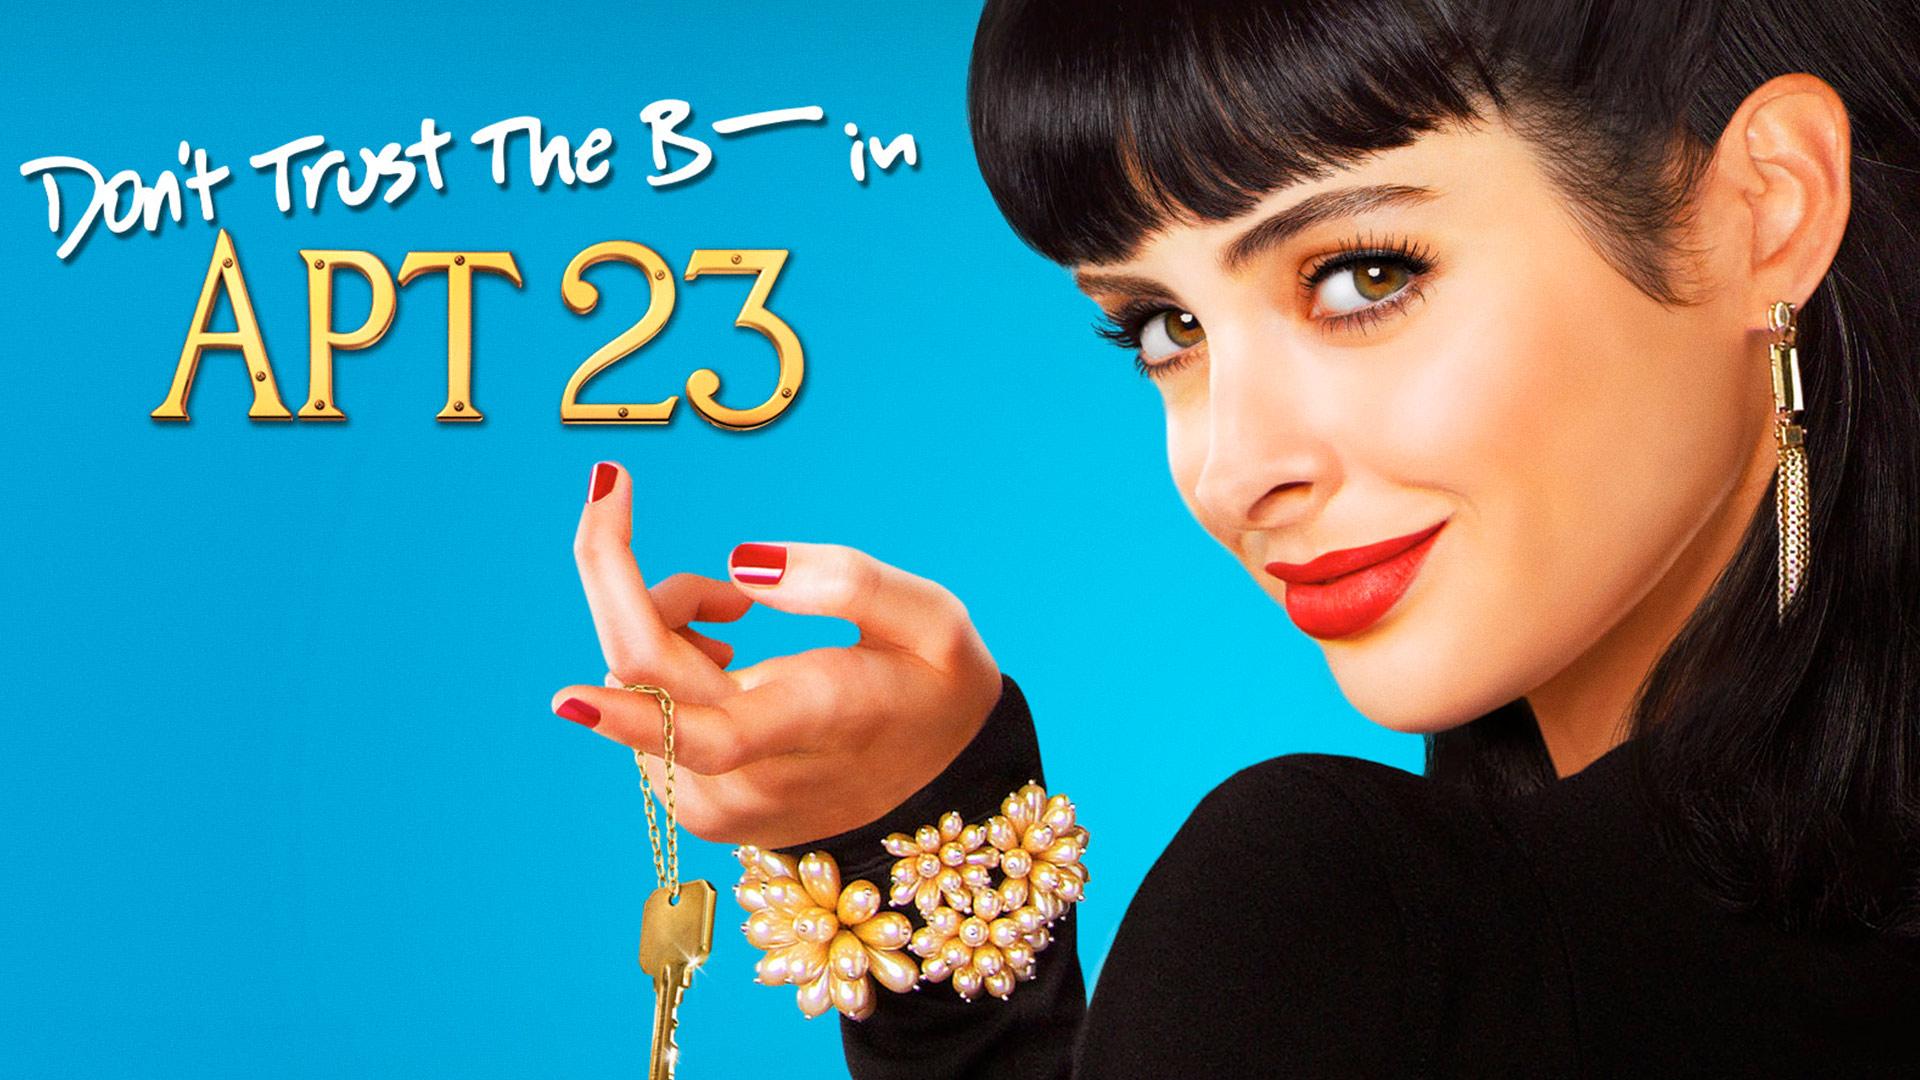 Don't Trust The B---- In Apartment 23 Season 1